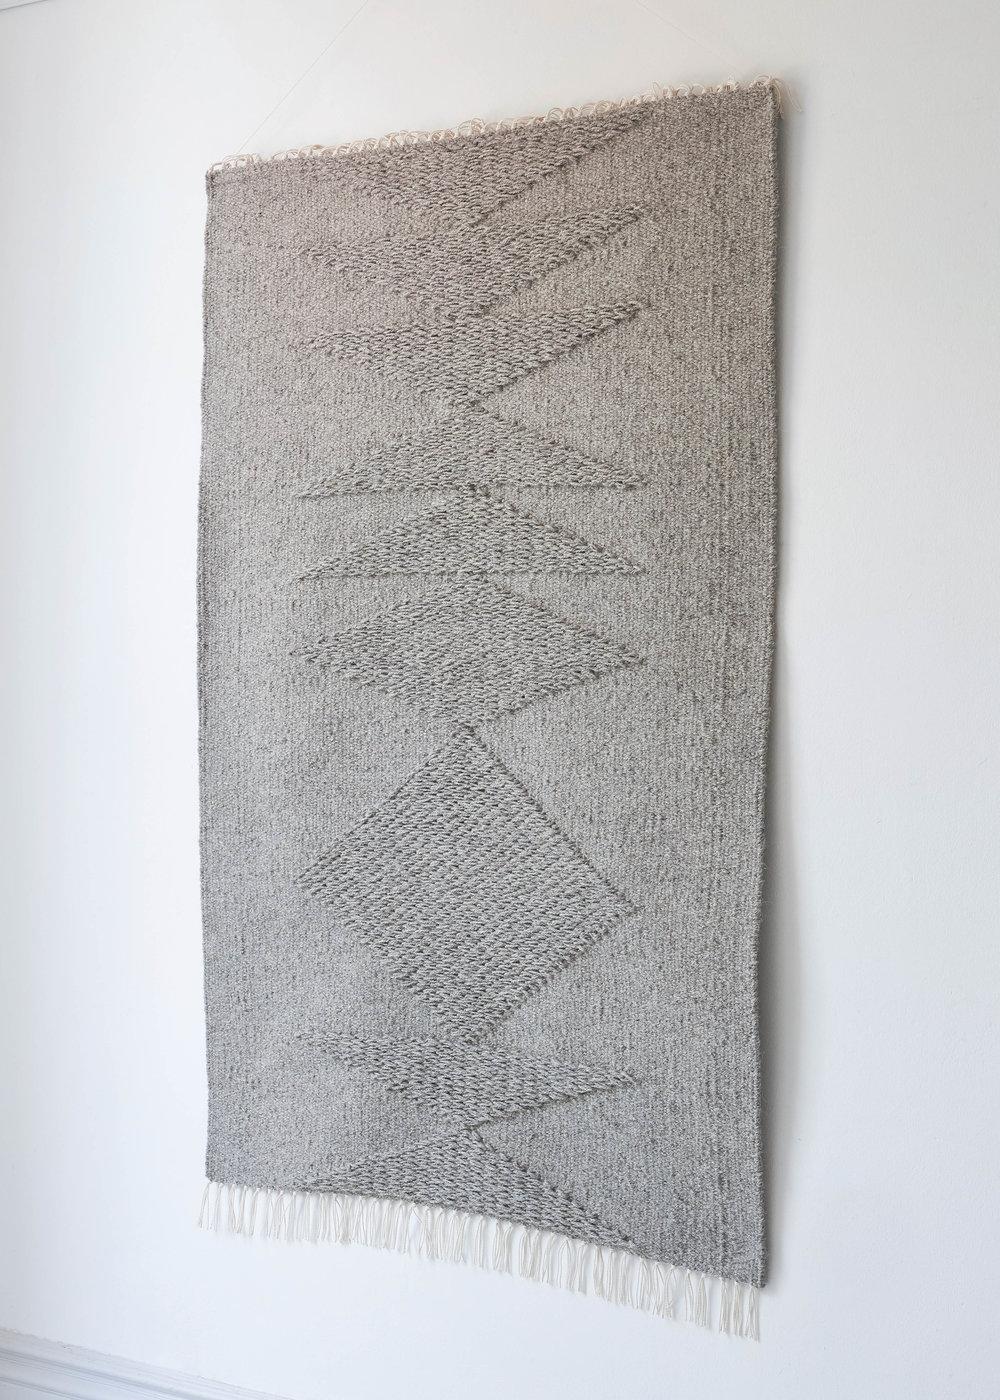 Christabel-Balfour-Concrete 002.jpg